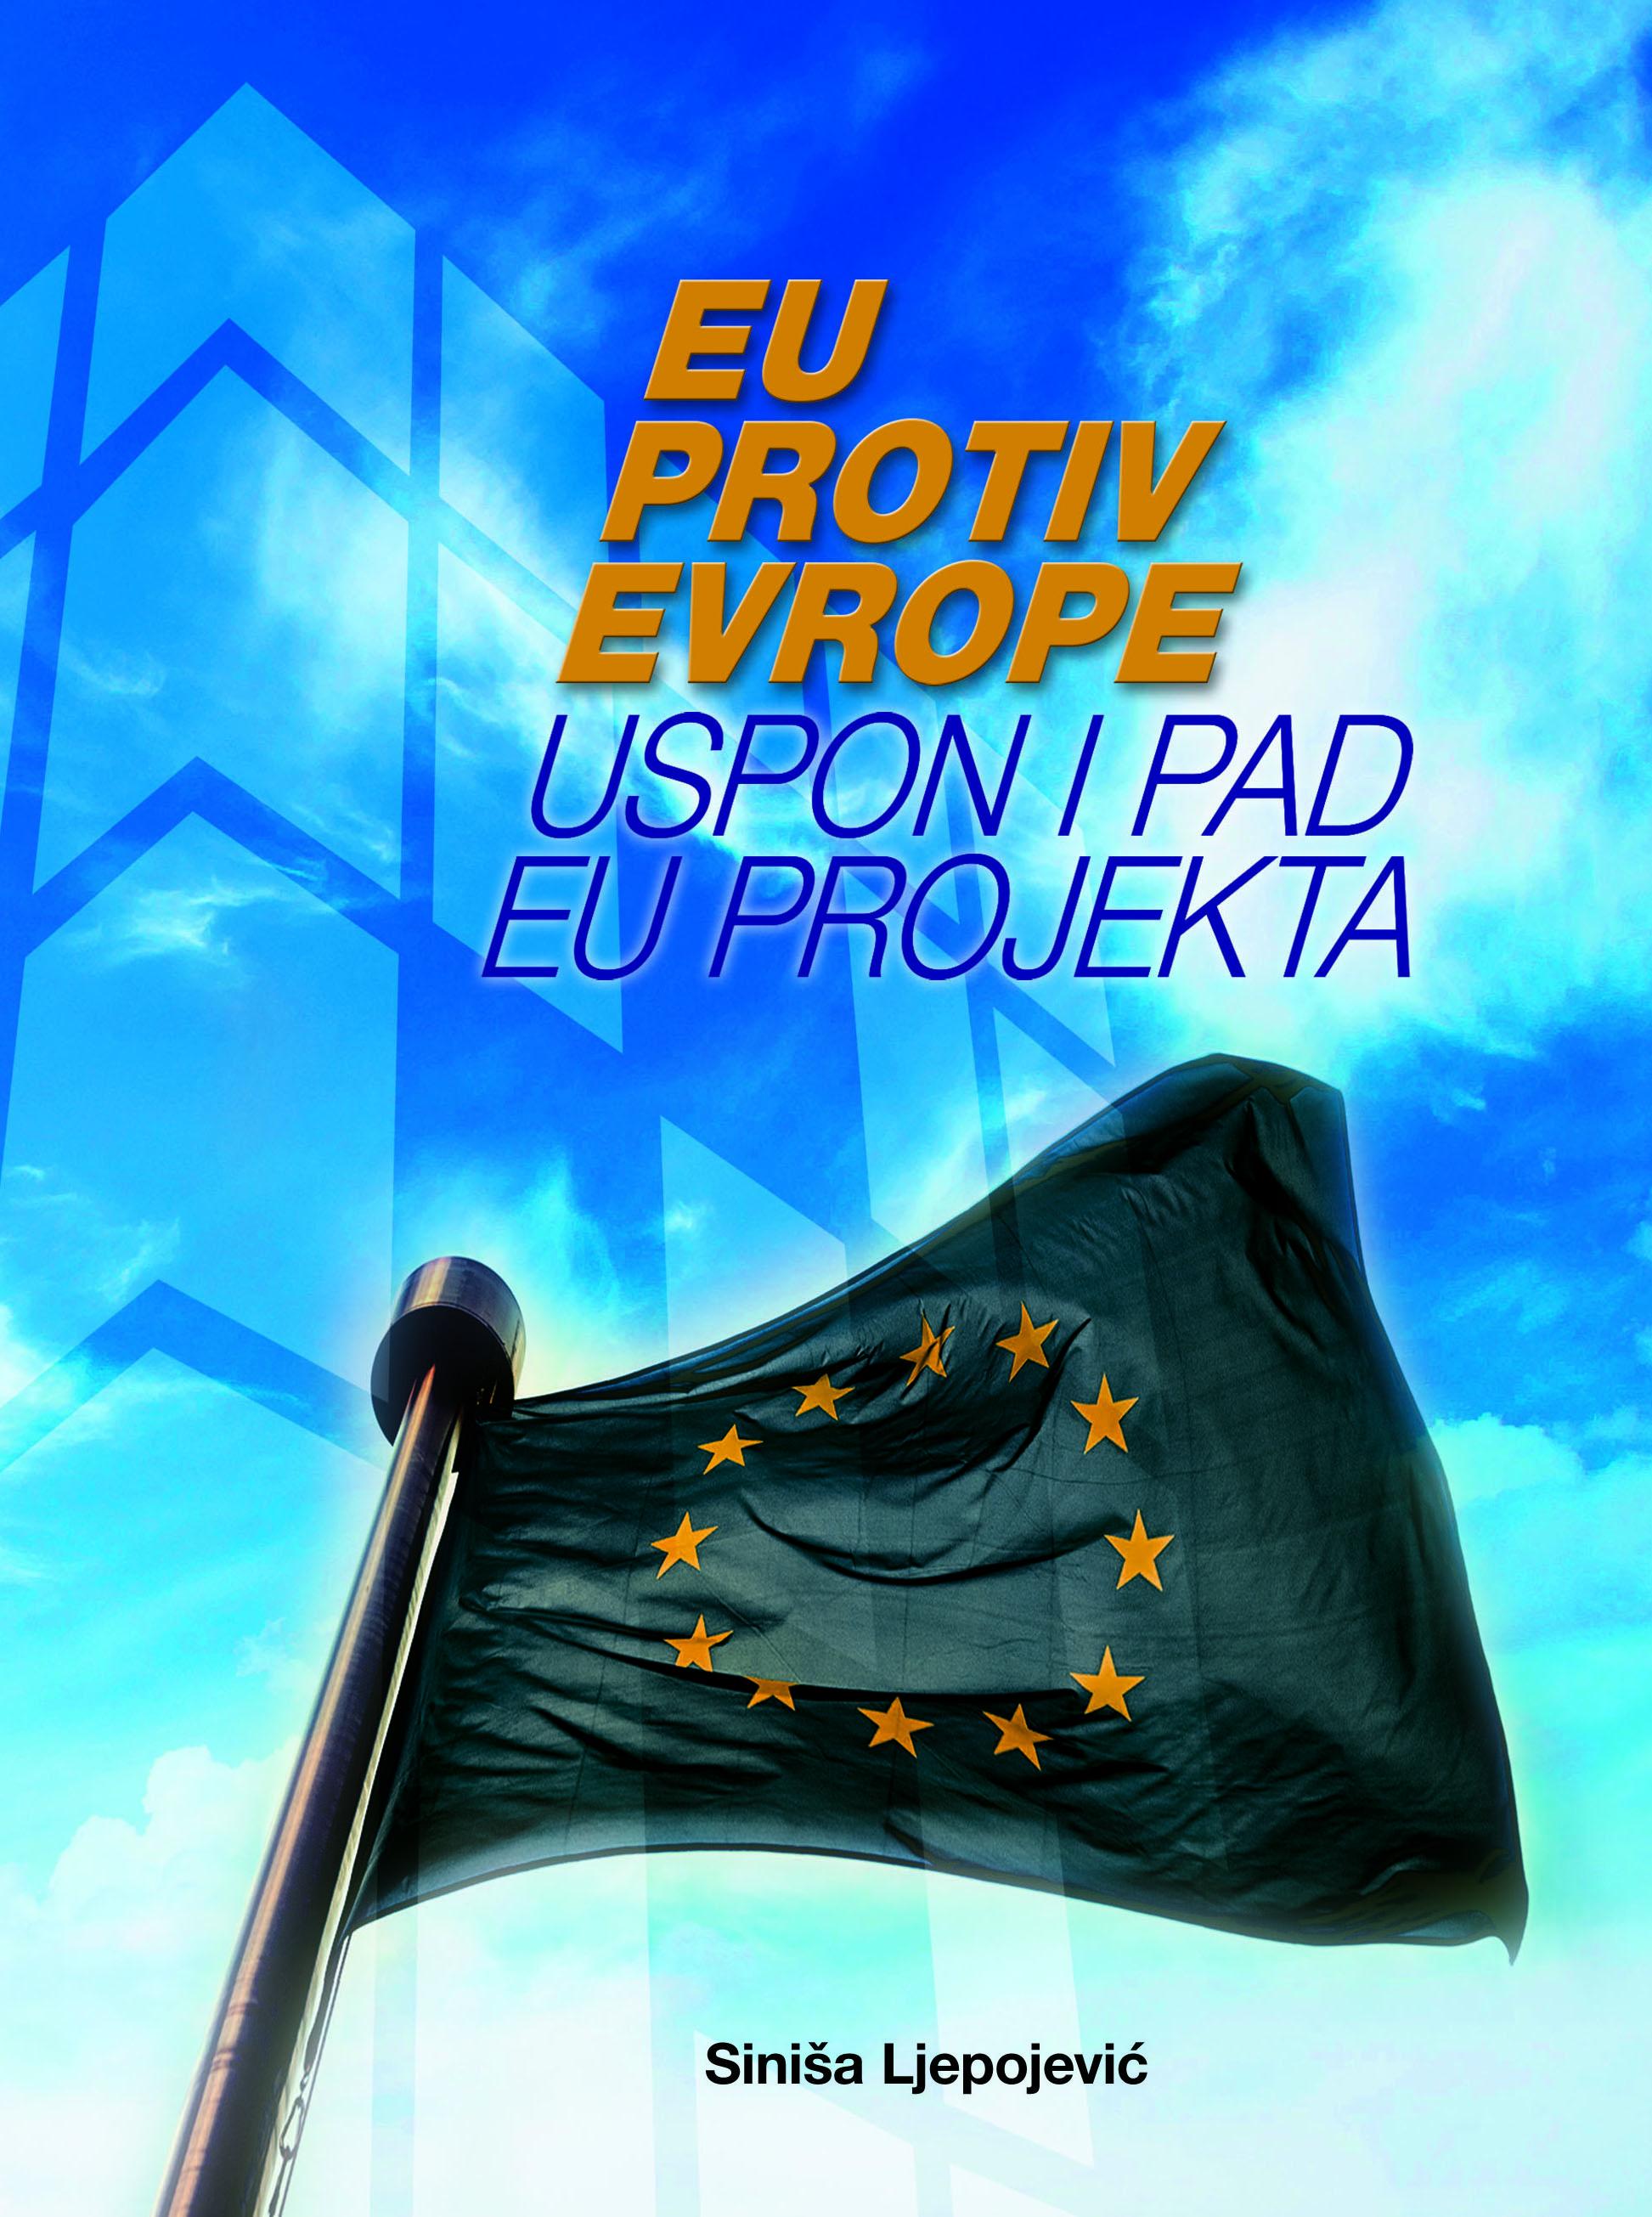 EU protiv Evrope, uspon i pad EU projekta